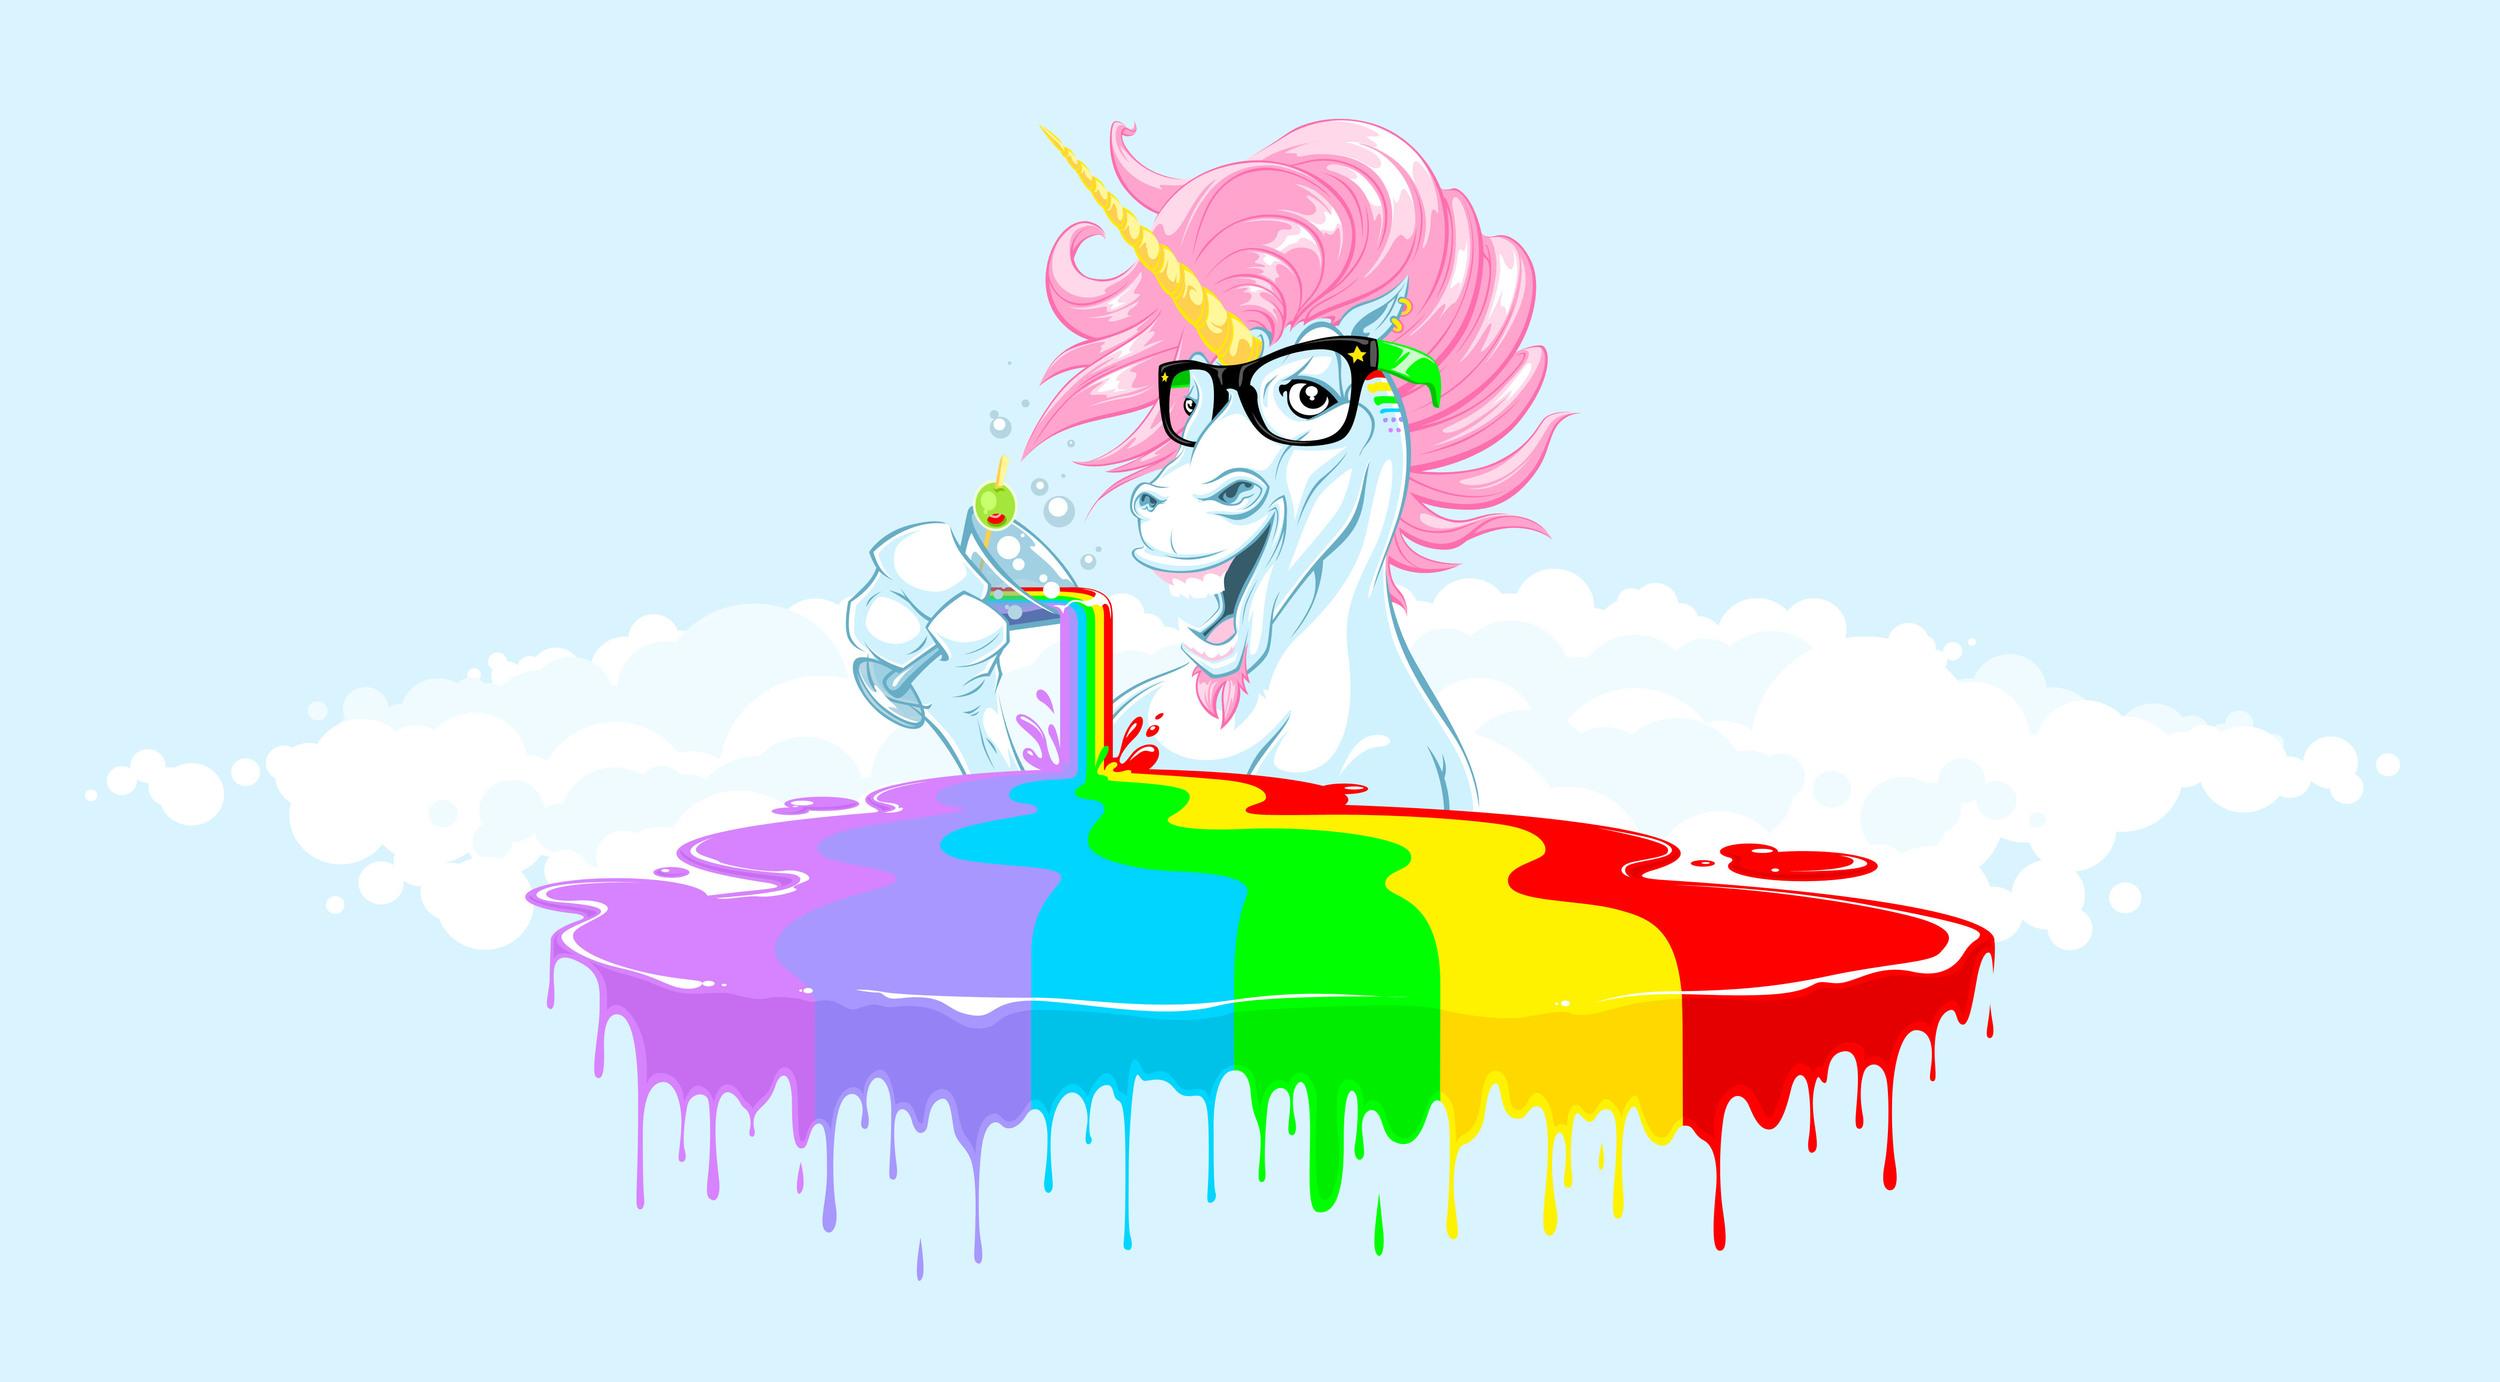 ...unicorn libation final design...